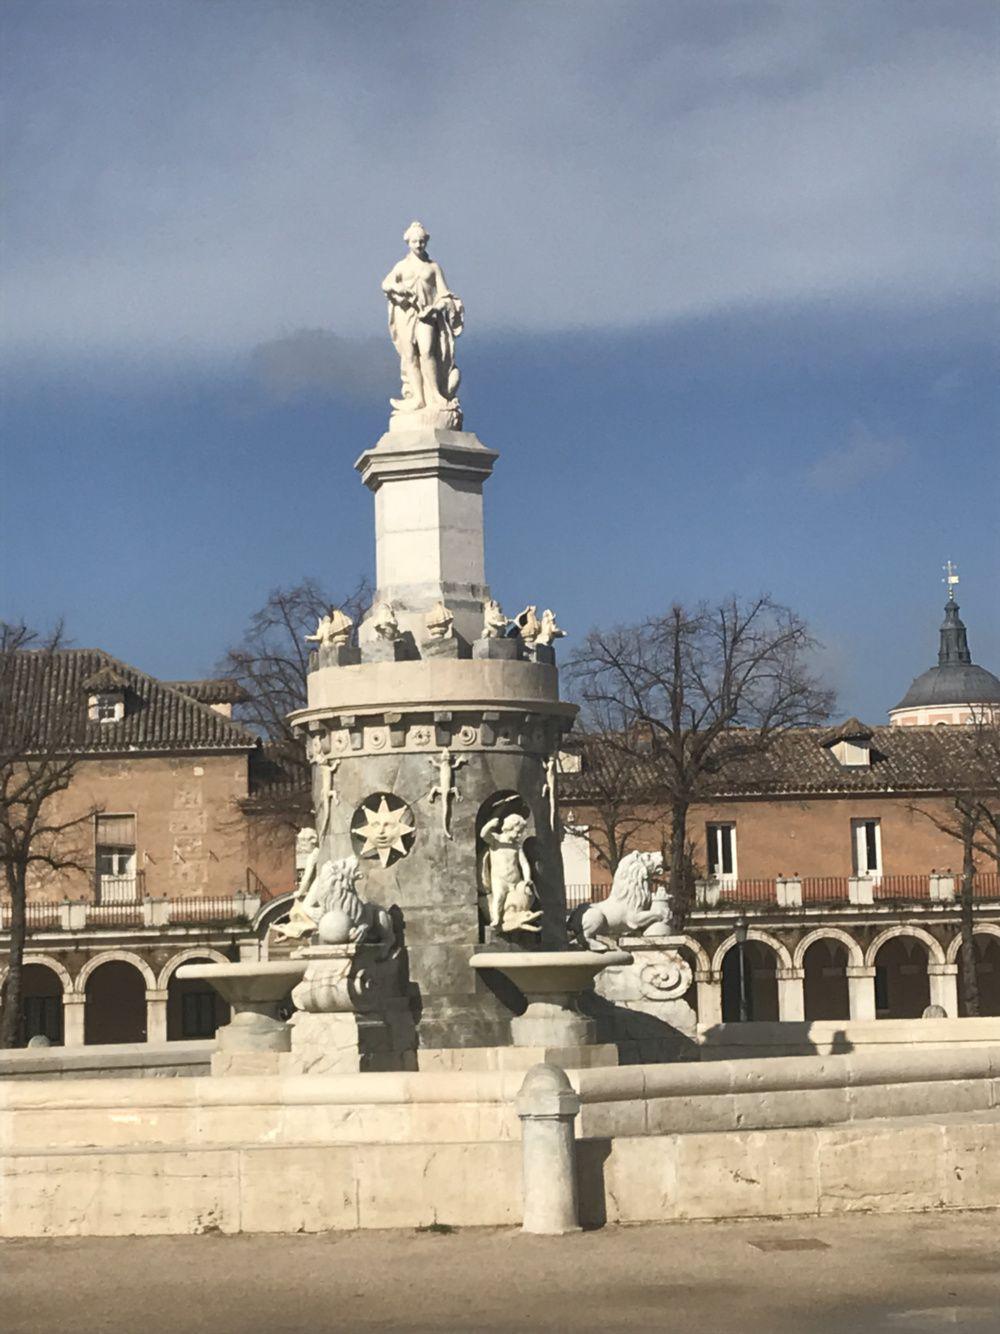 Madrid #1 : Aranjuez